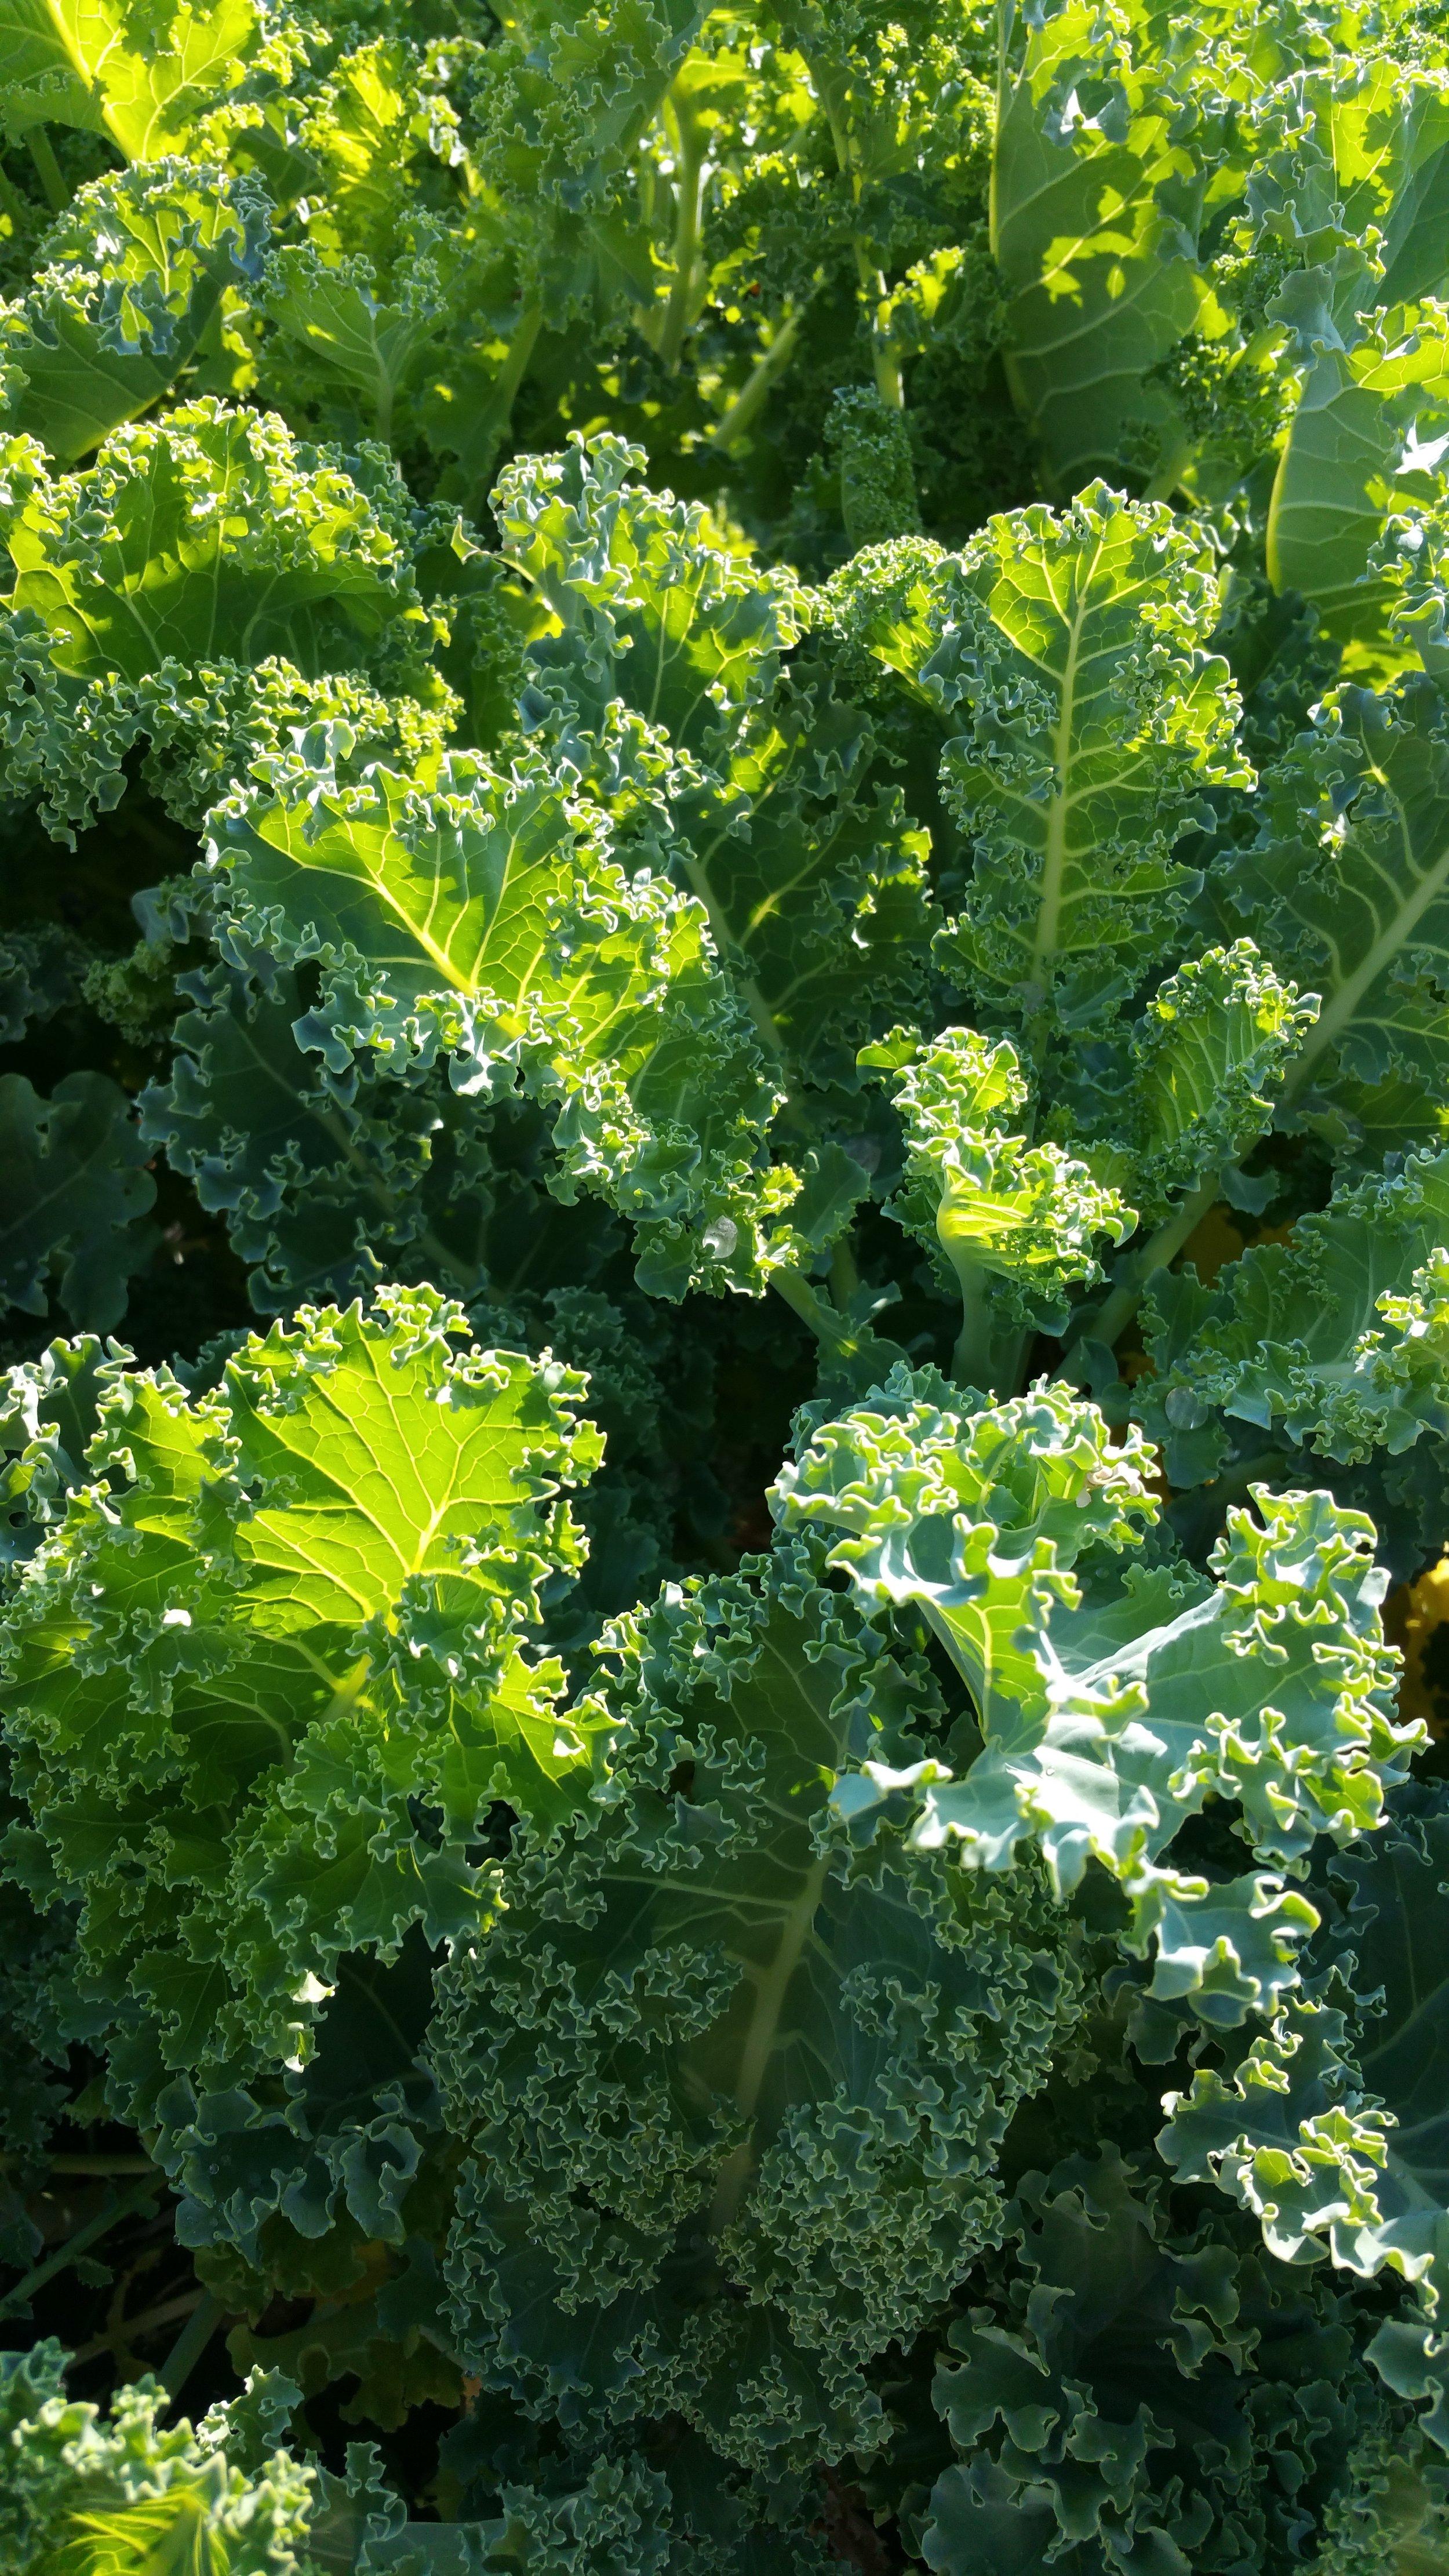 Green Nash Kale